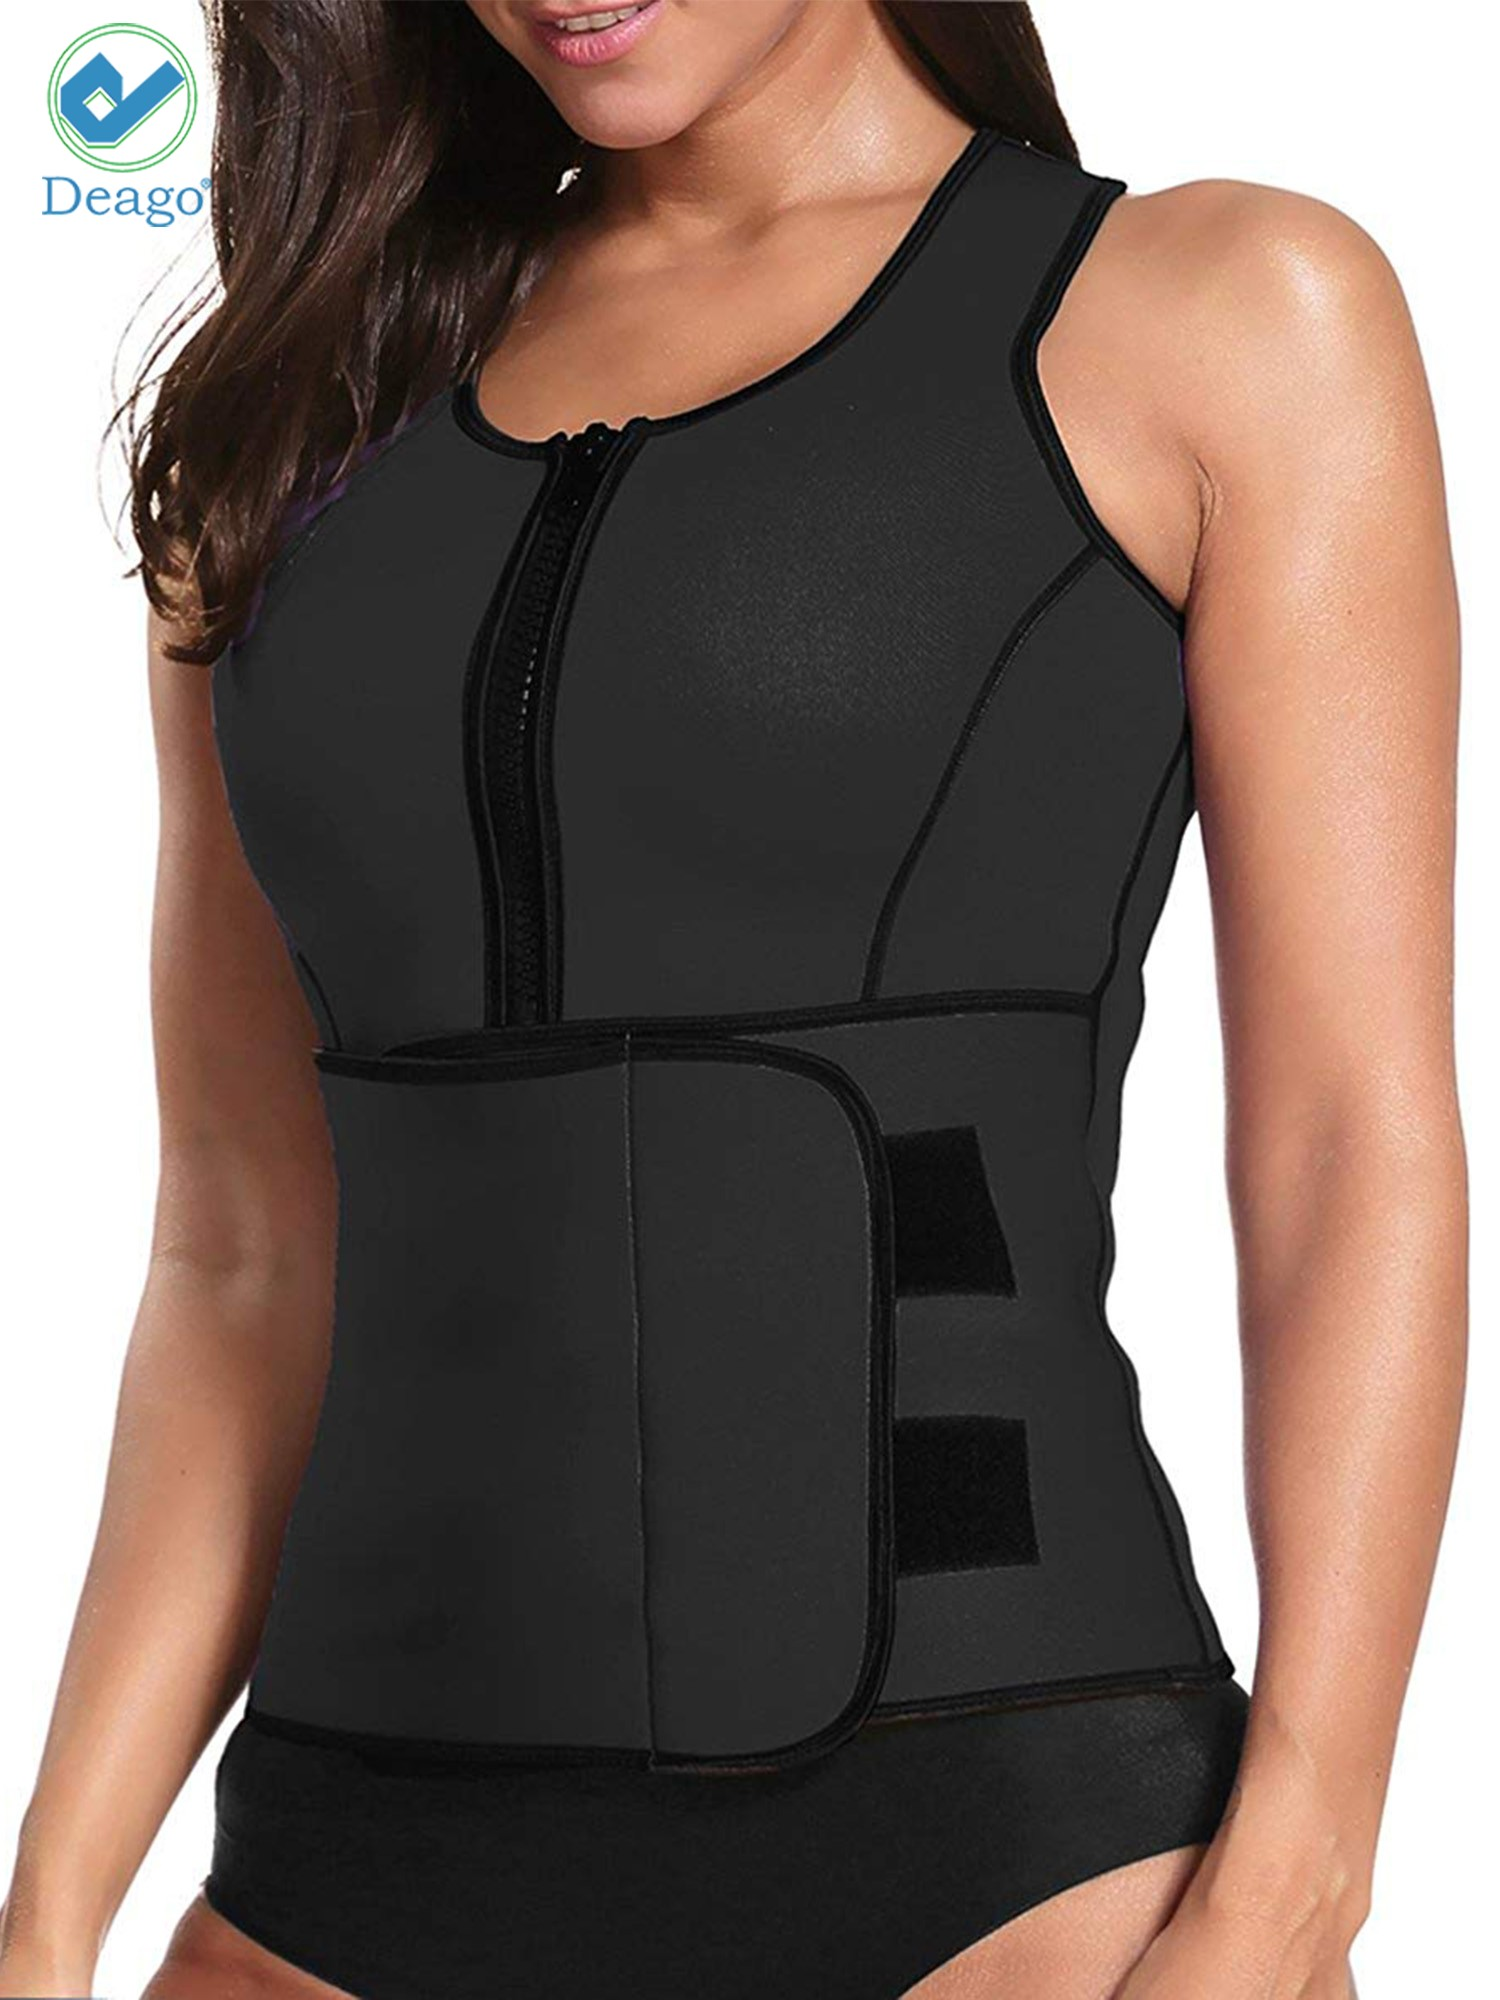 d117feae168 Deago - Deago Womens Neoprene Sauna Suit Waist Trainer Zipper Vest with  Adjustable Waist Trimmer Belt Body Shaper Corset - Walmart.com